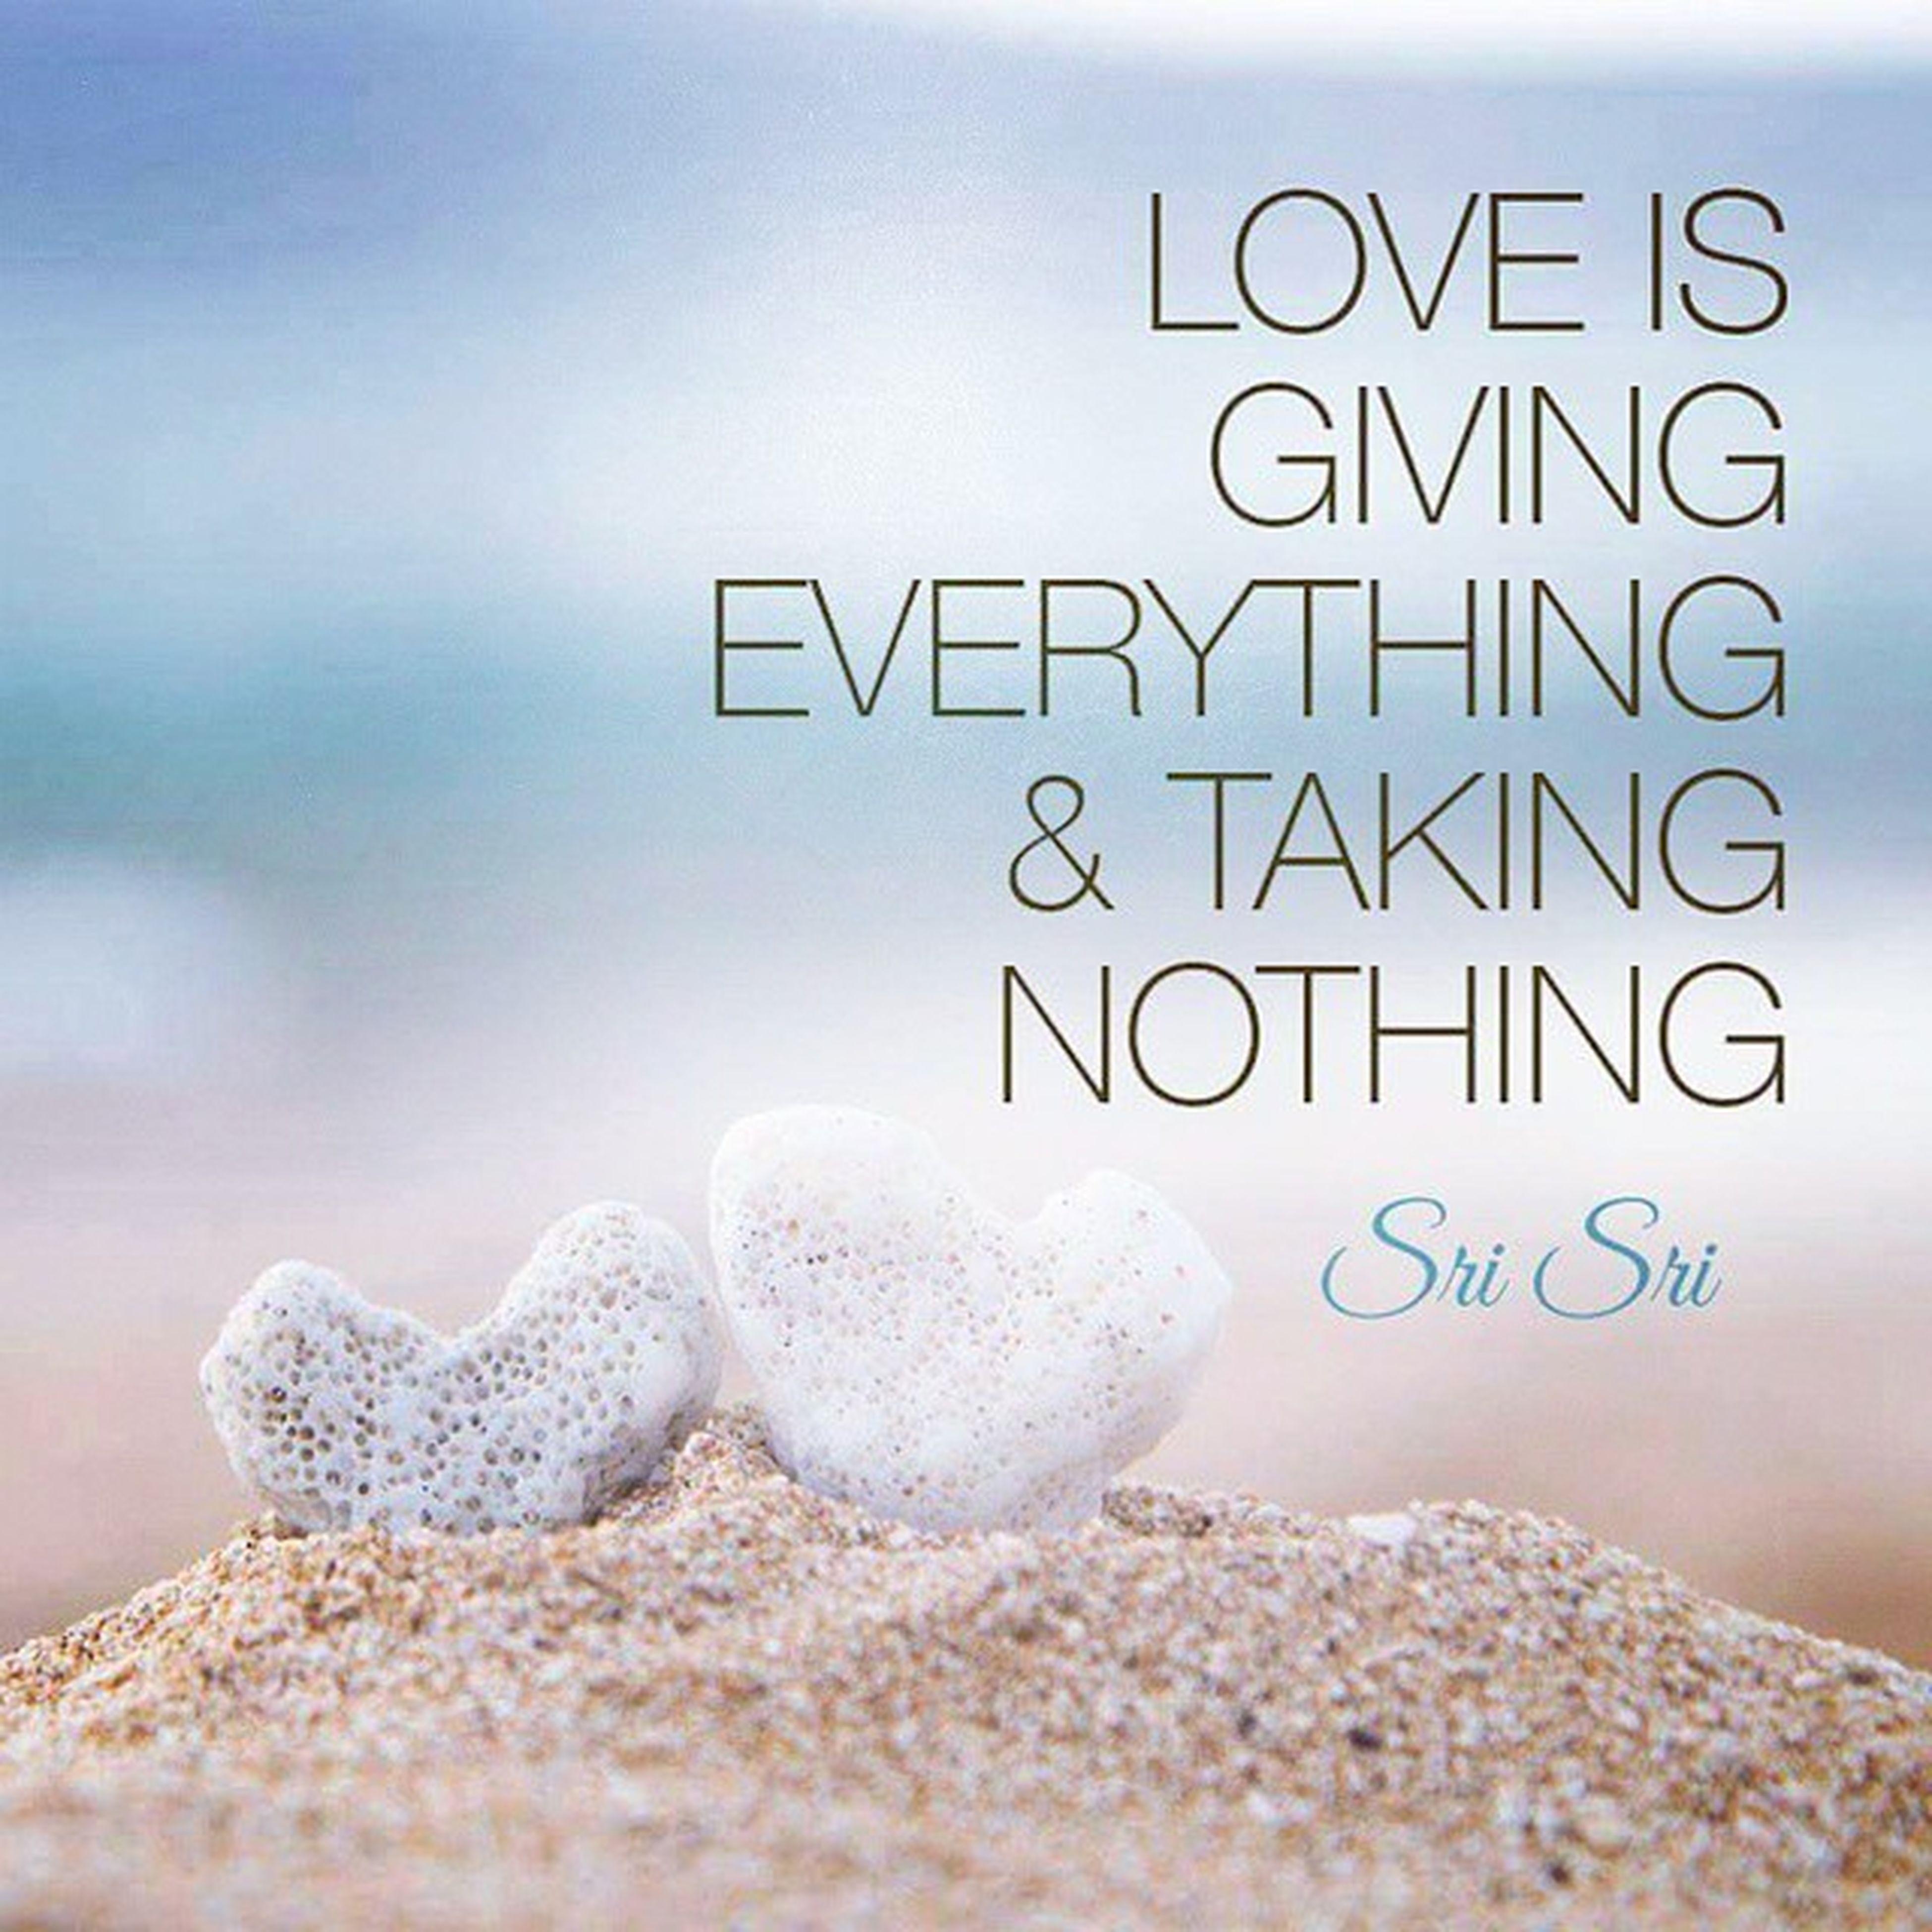 Love True Deep Quote Jalandhar Punjab 2015  Feeling Rightsaid